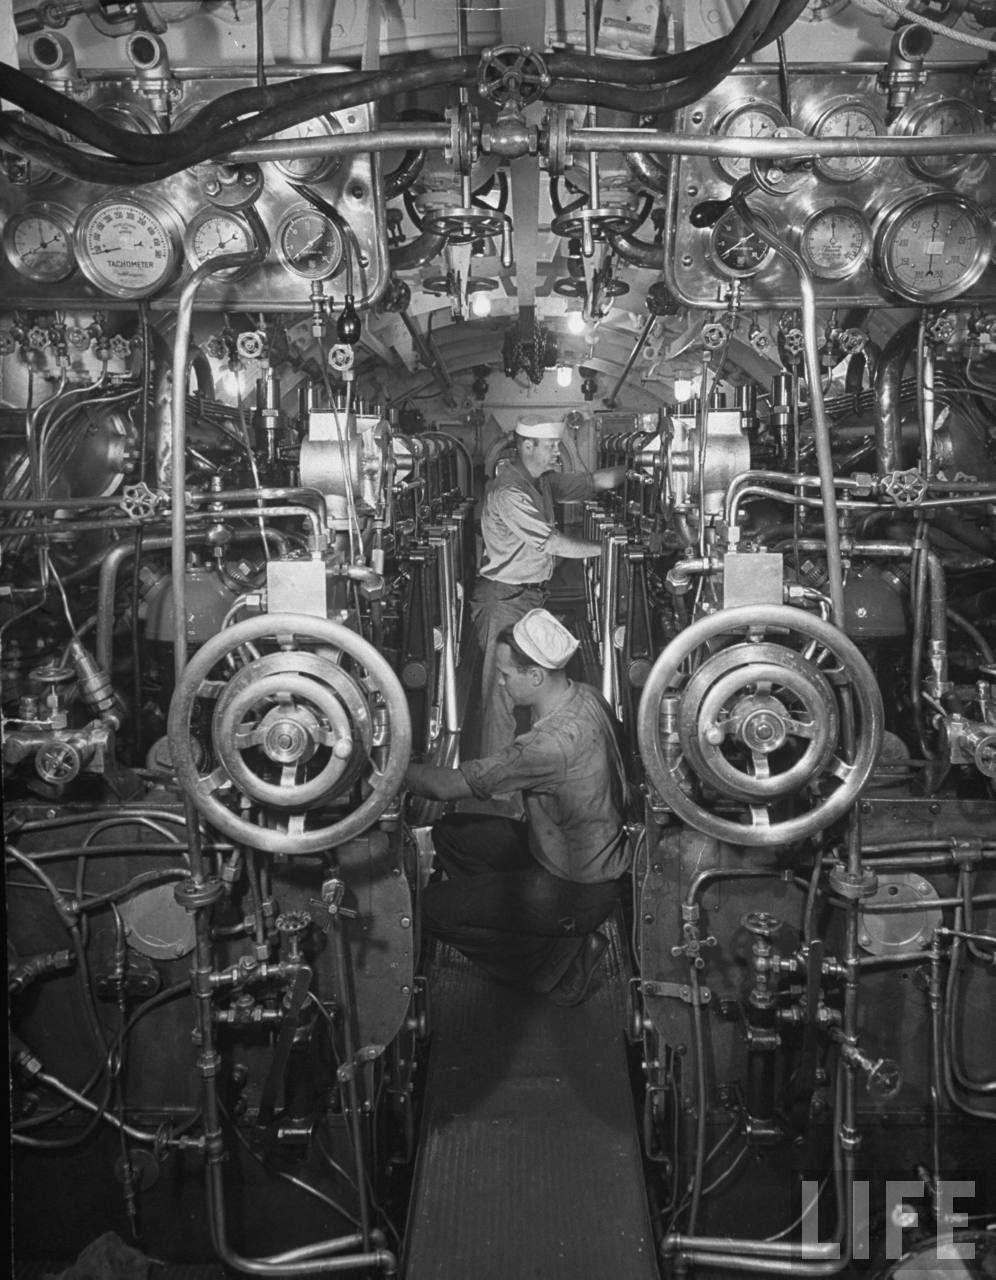 The Engine Room Design: Pin On U.S. Naval Submarine Service